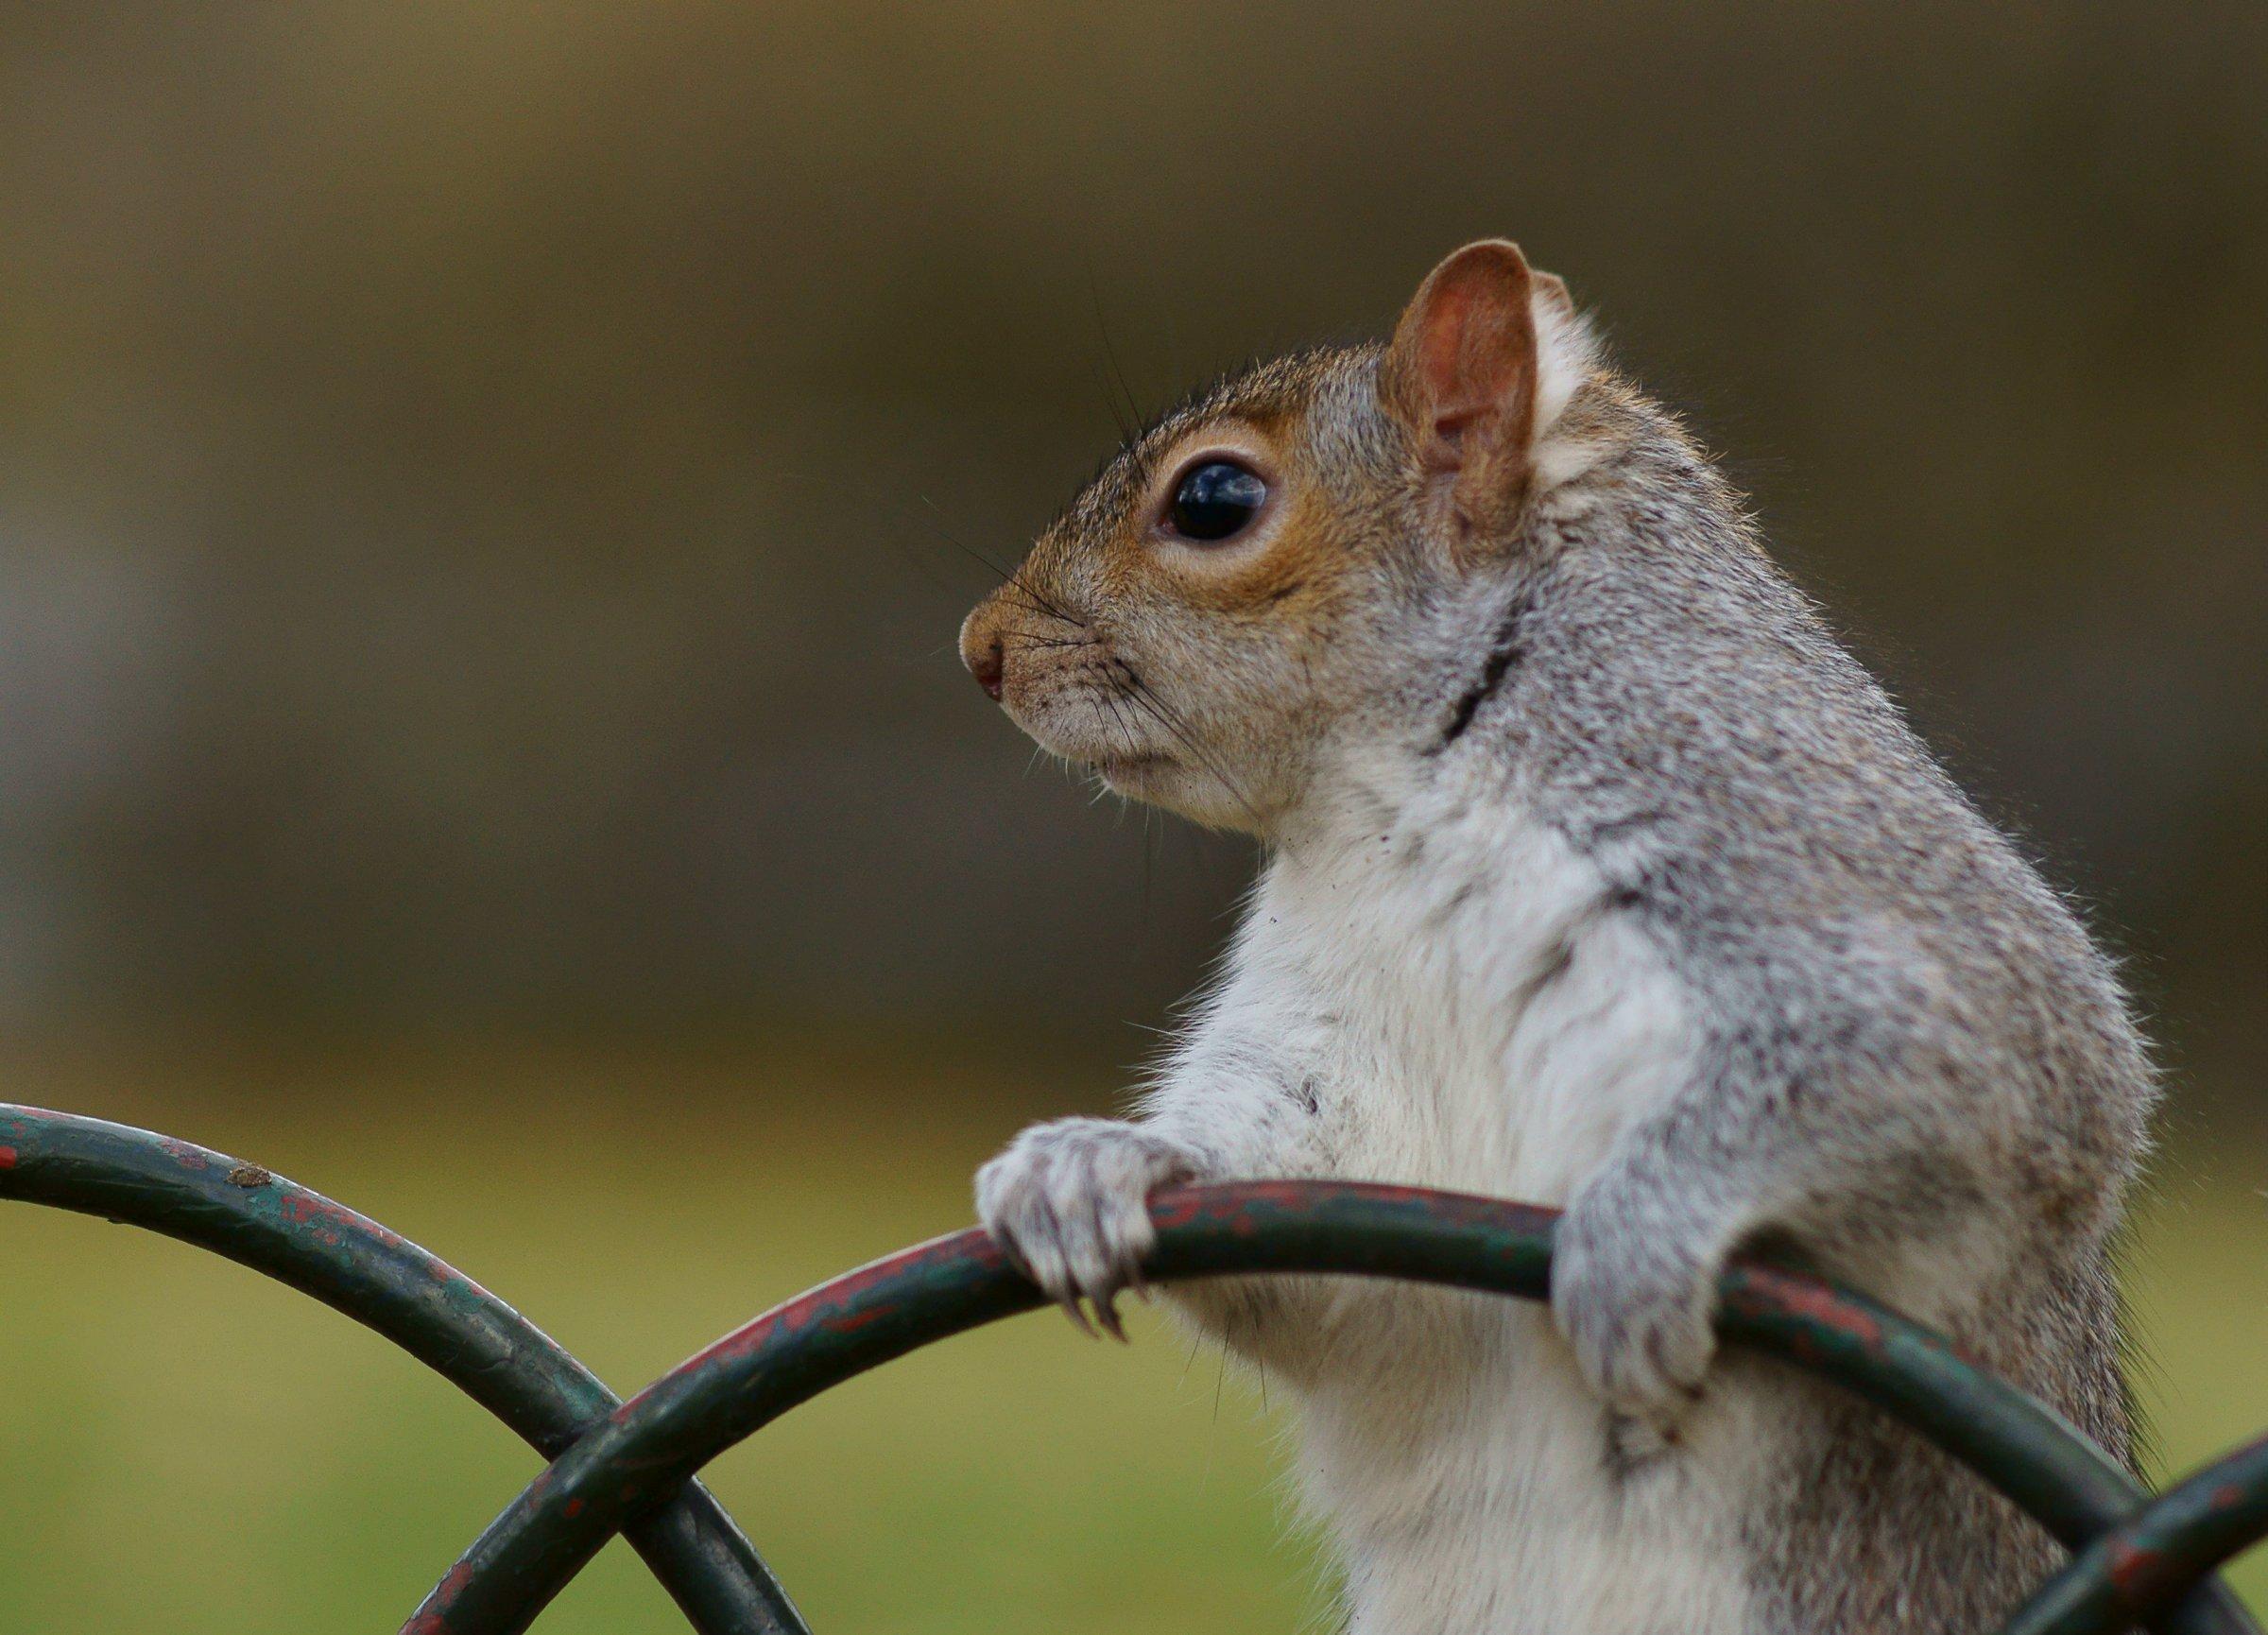 SquirrelBIBody